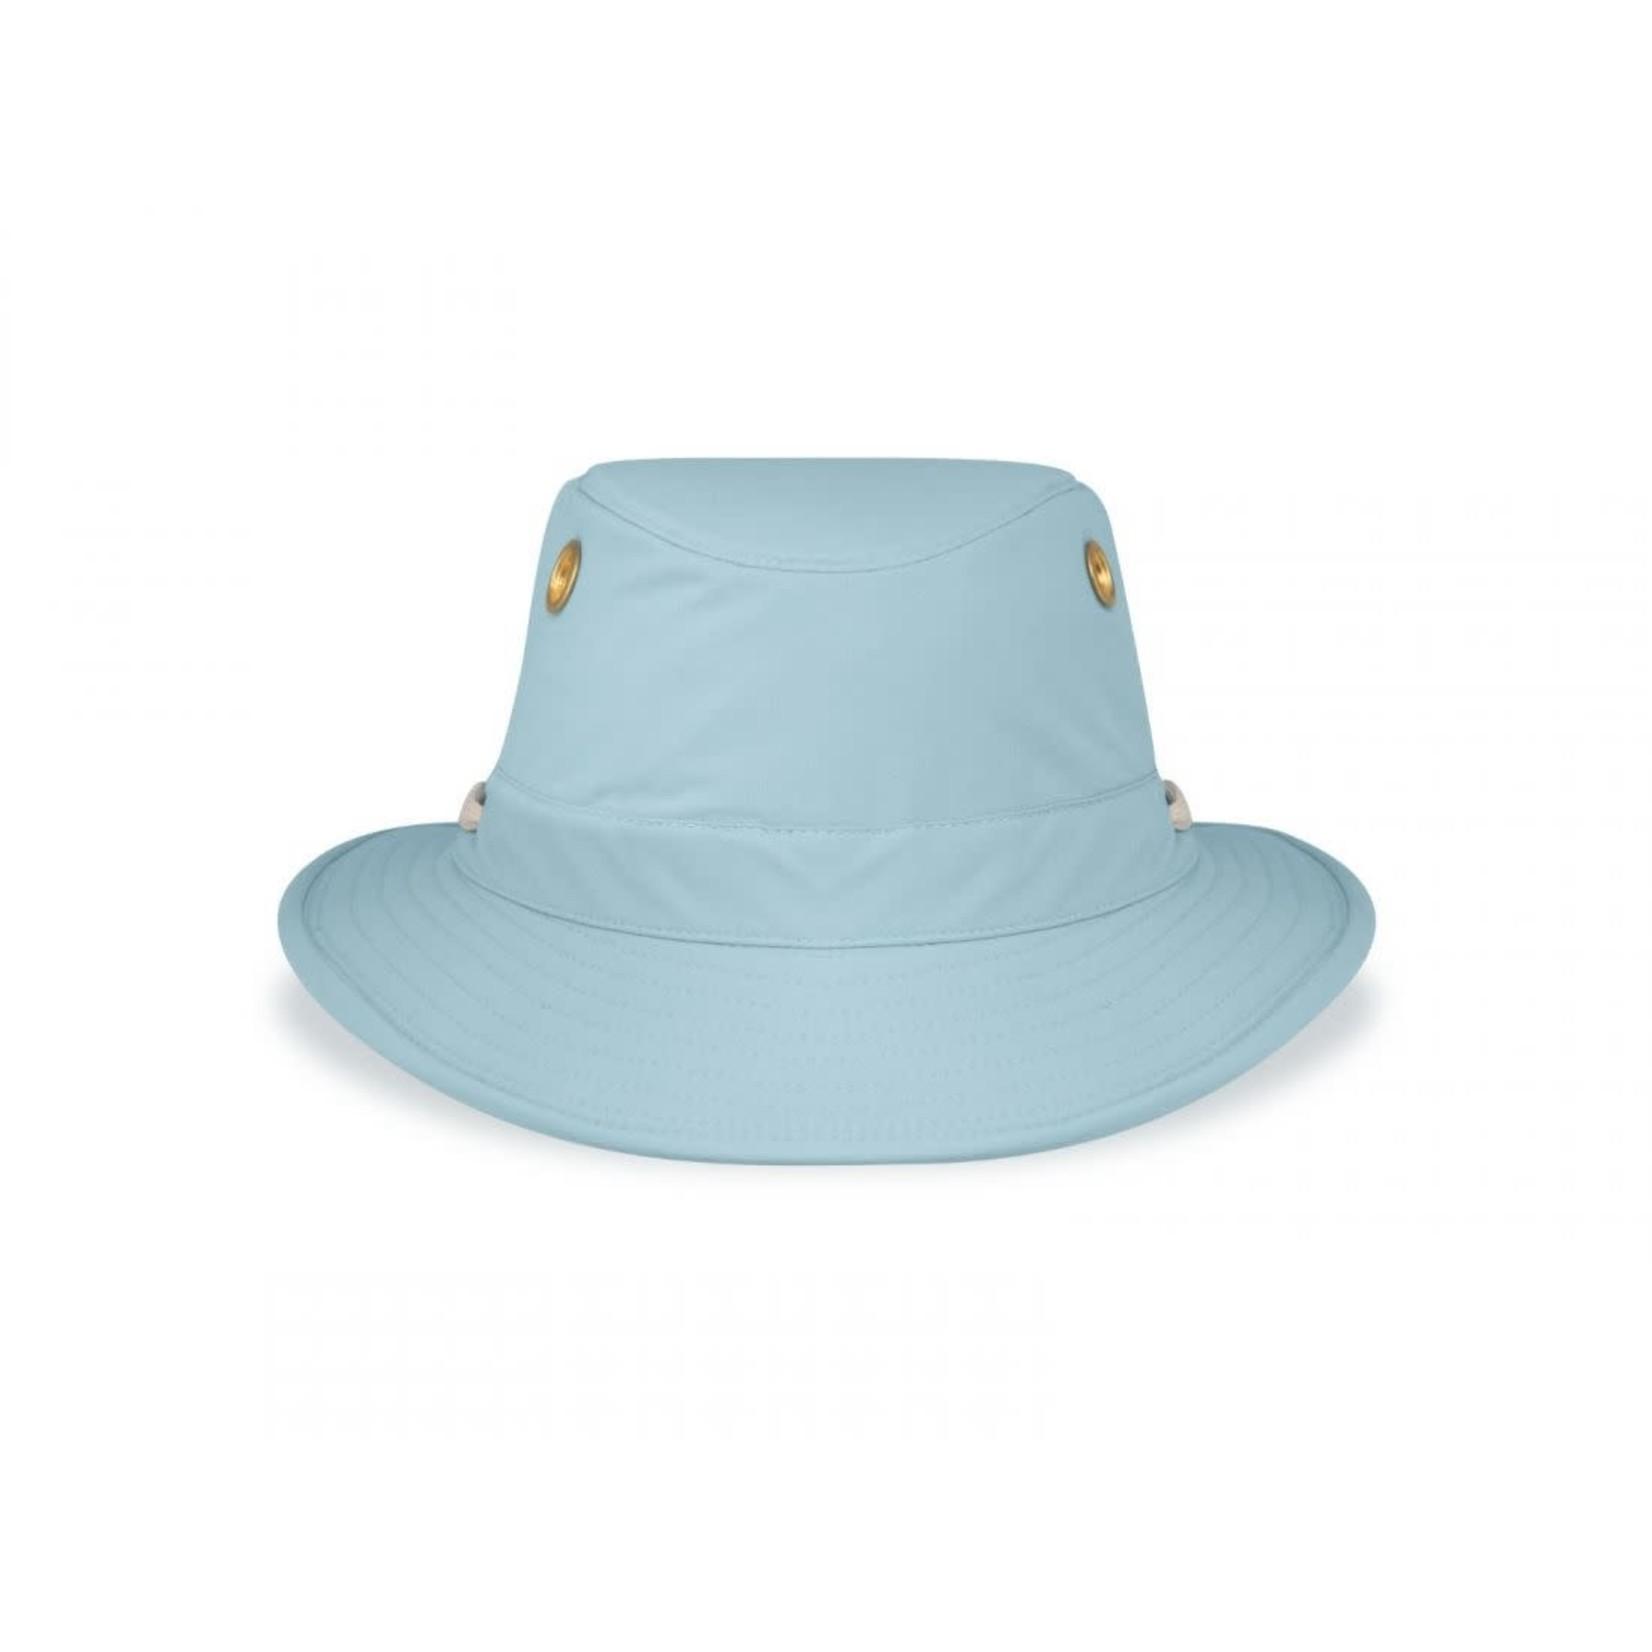 TILLEY ENDURABLES LT5B LIGHTWEIGHT NYLON HAT